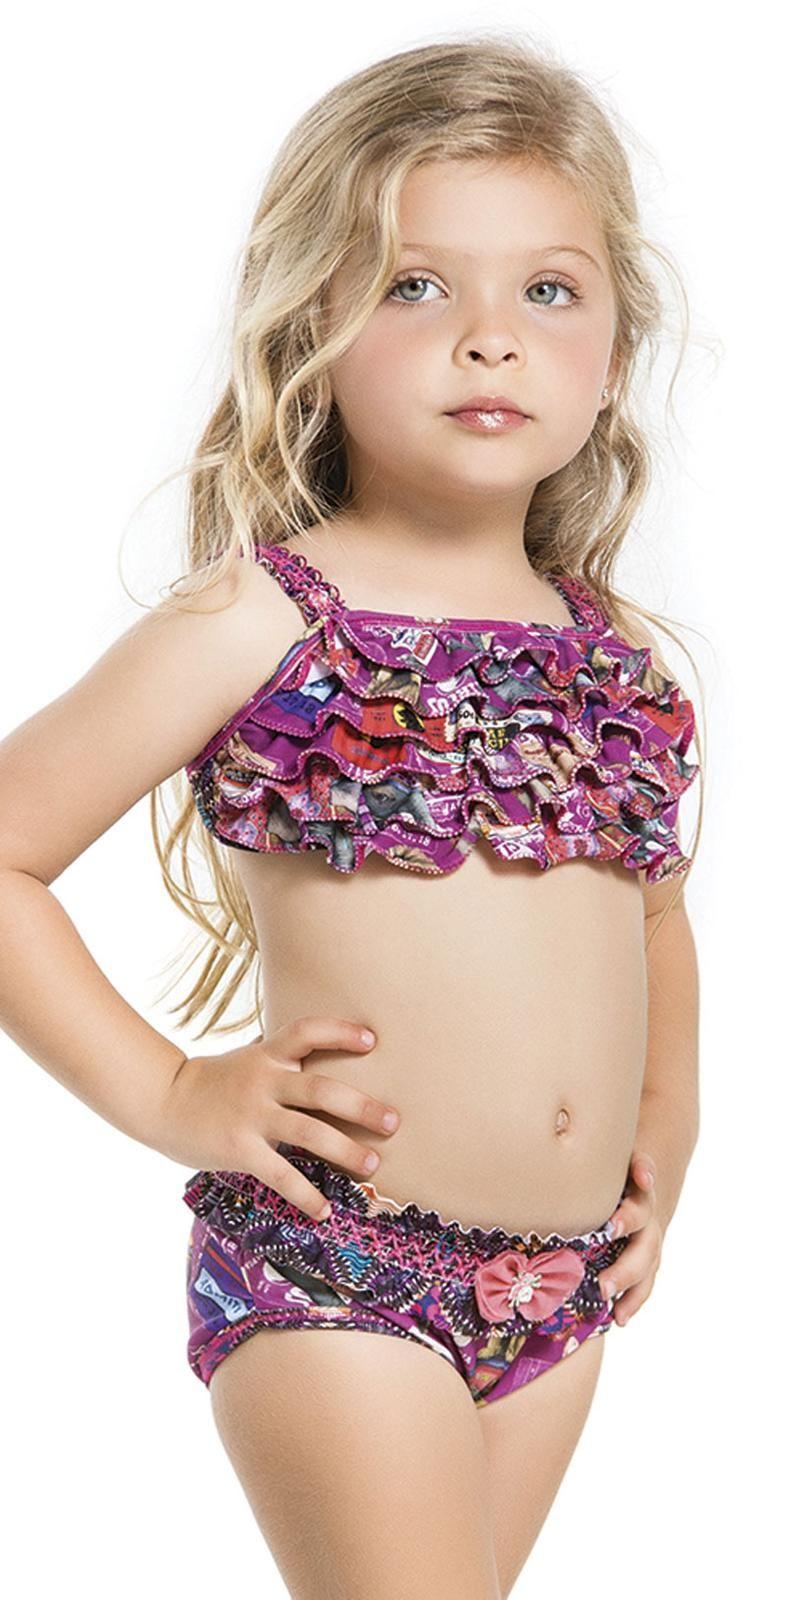 Little Girls Bikini | Kids Girls Swimsuits ☀ | Pinterest